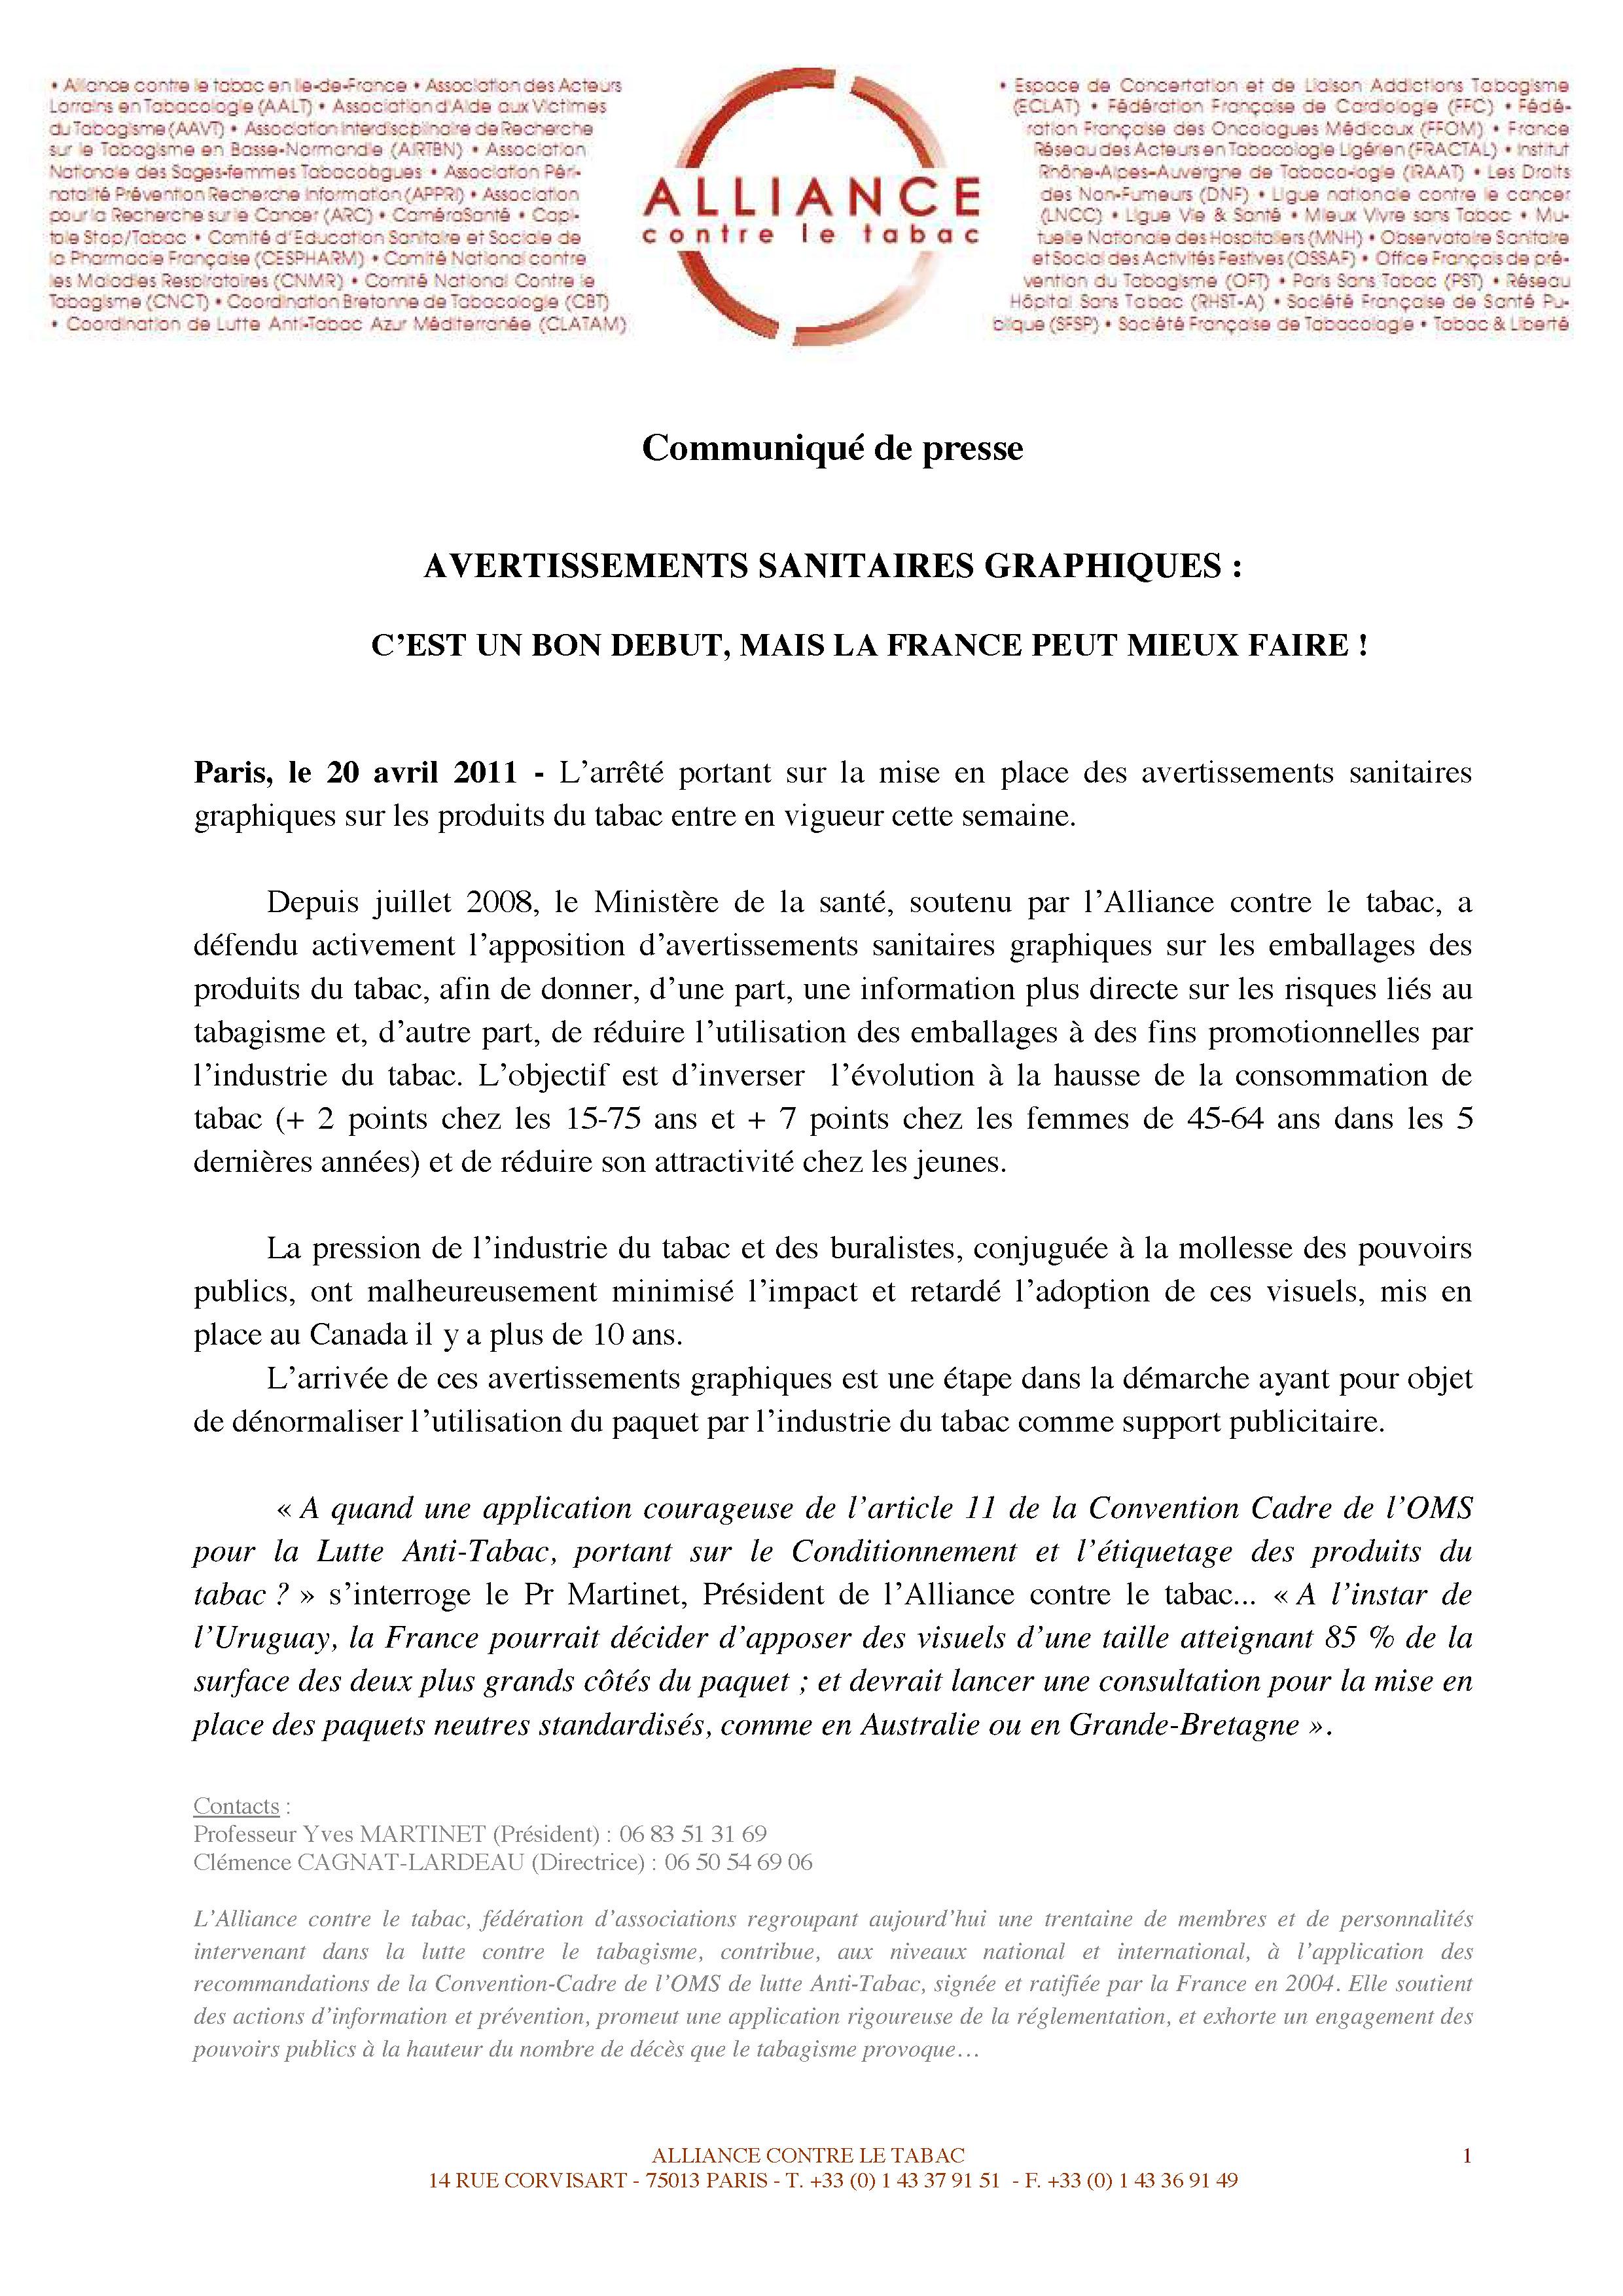 Alliance-CP_avertissements-sanitaires-graphiques-20avr2011.jpg